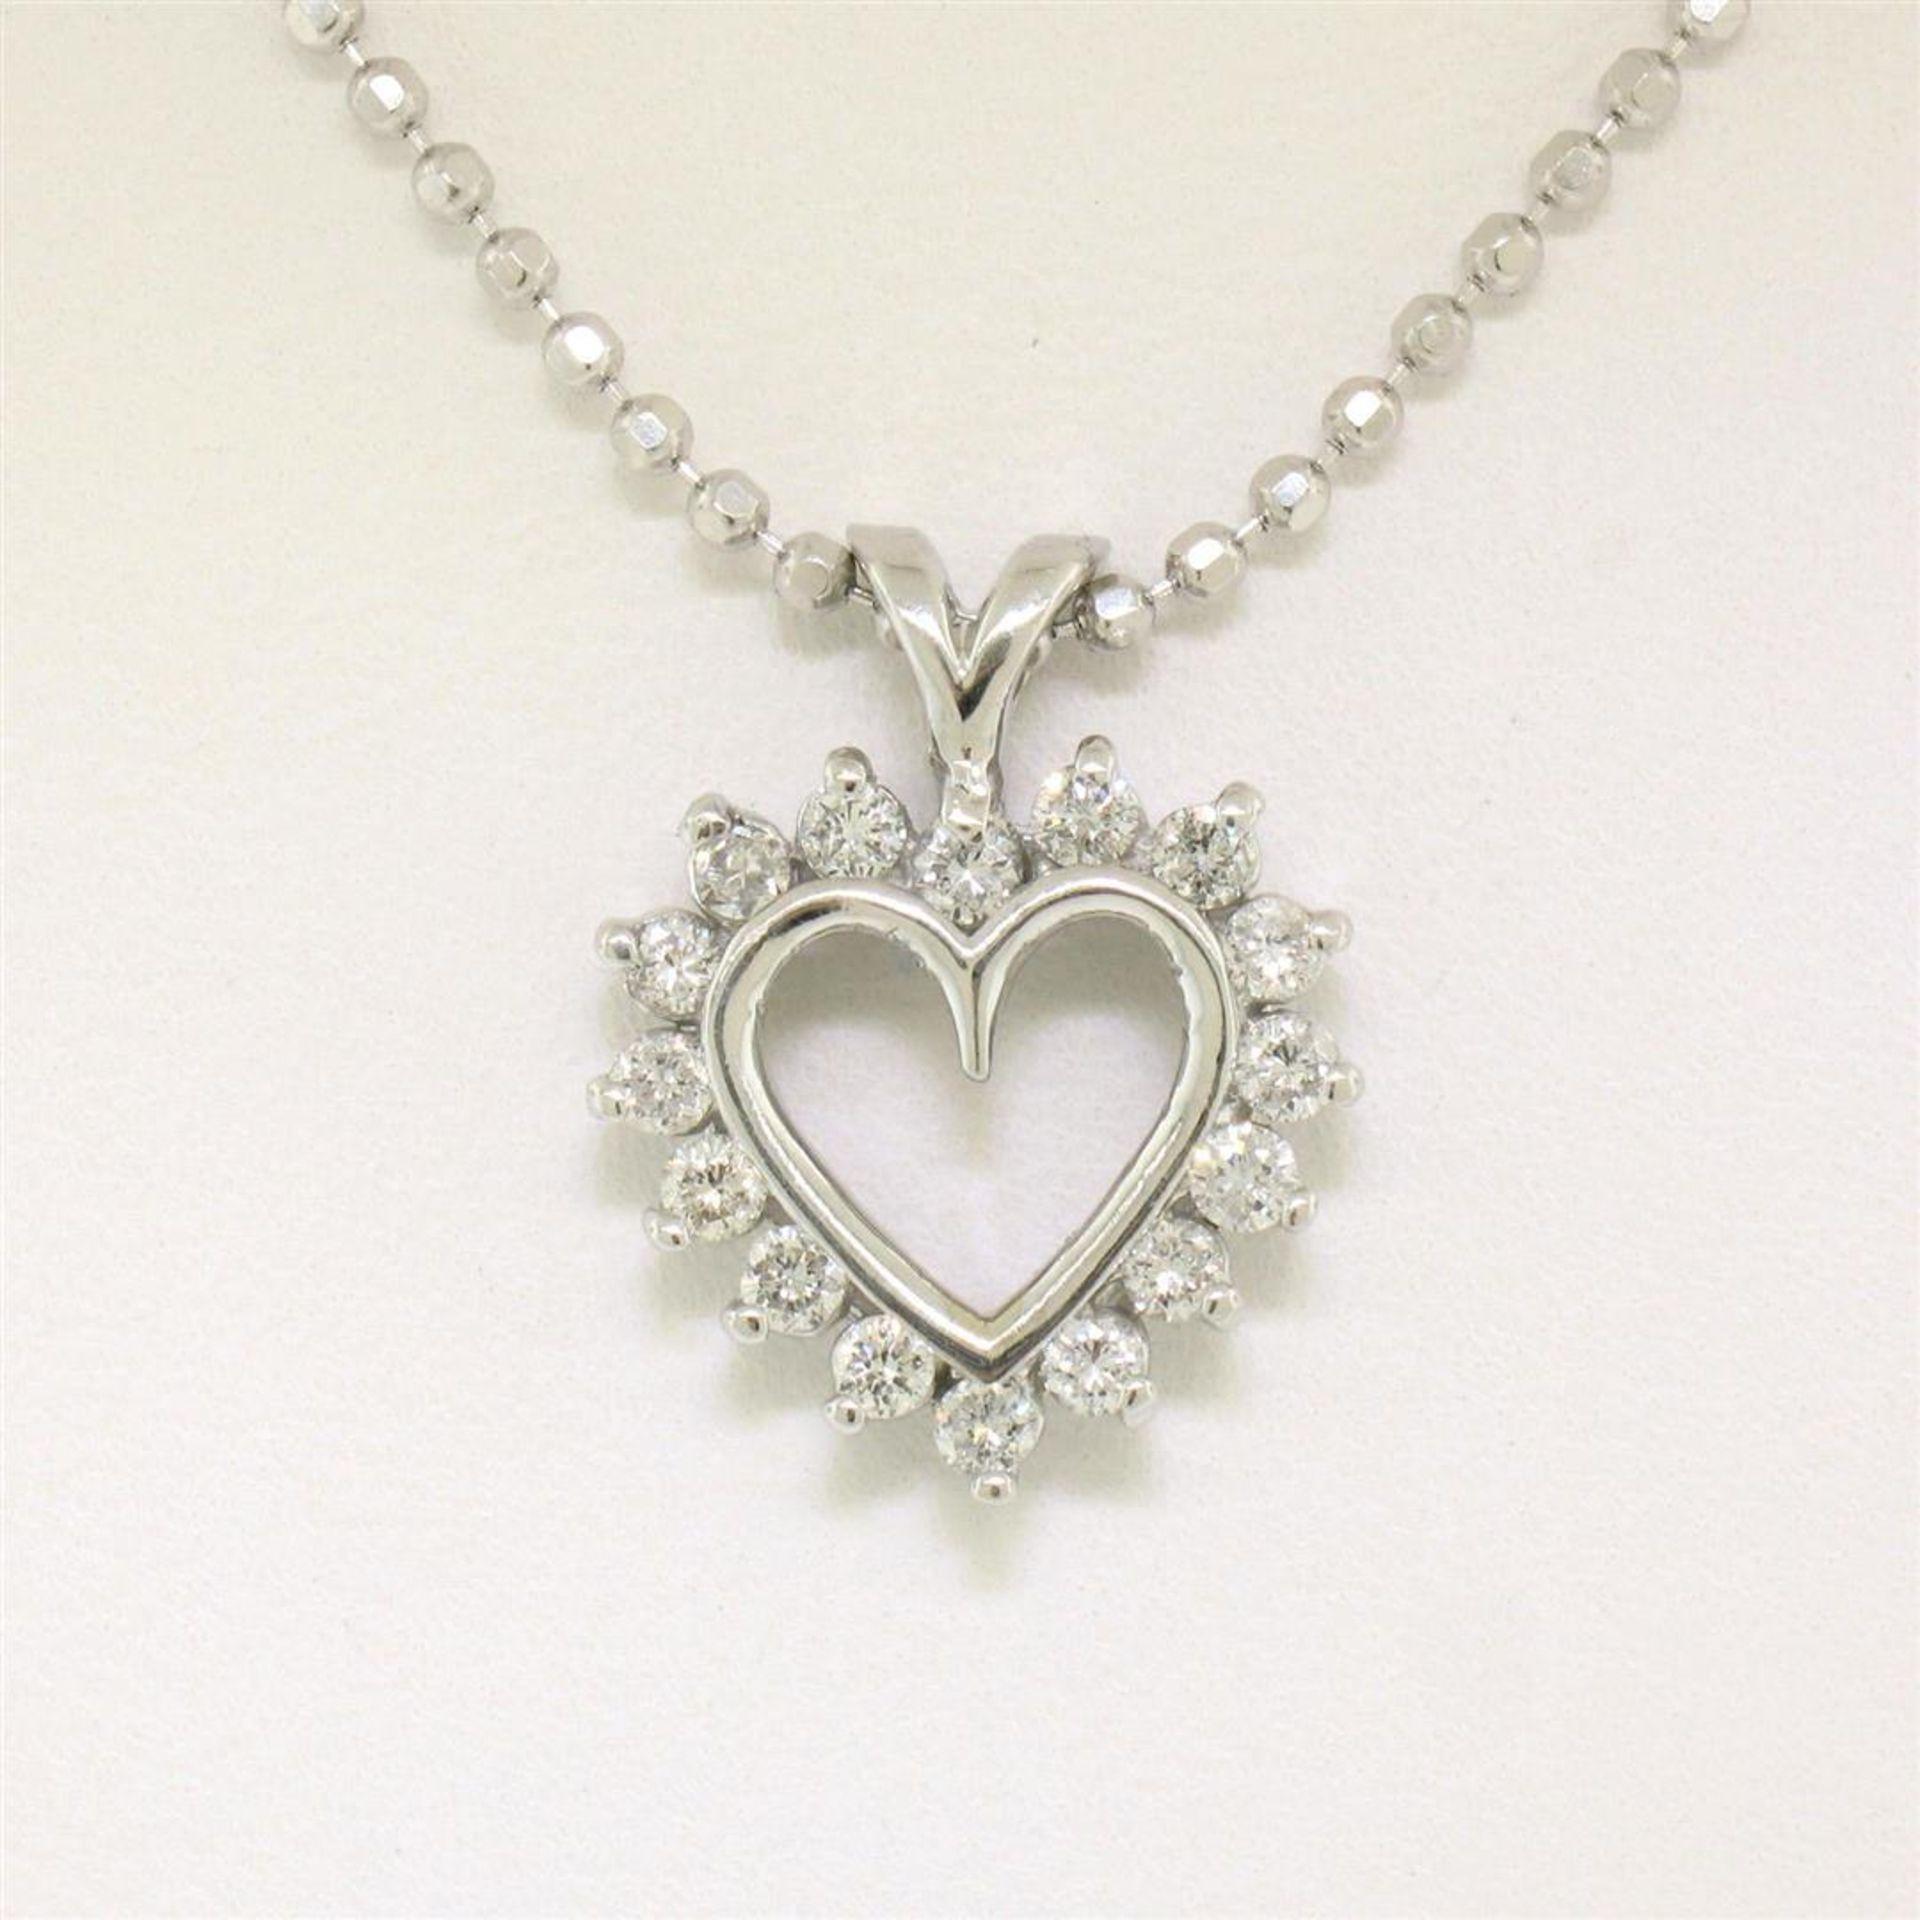 "14k White Gold 0.40 ctw Round Brilliant Diamond Open Heart Pendant 18"" Bead Chai - Image 3 of 7"